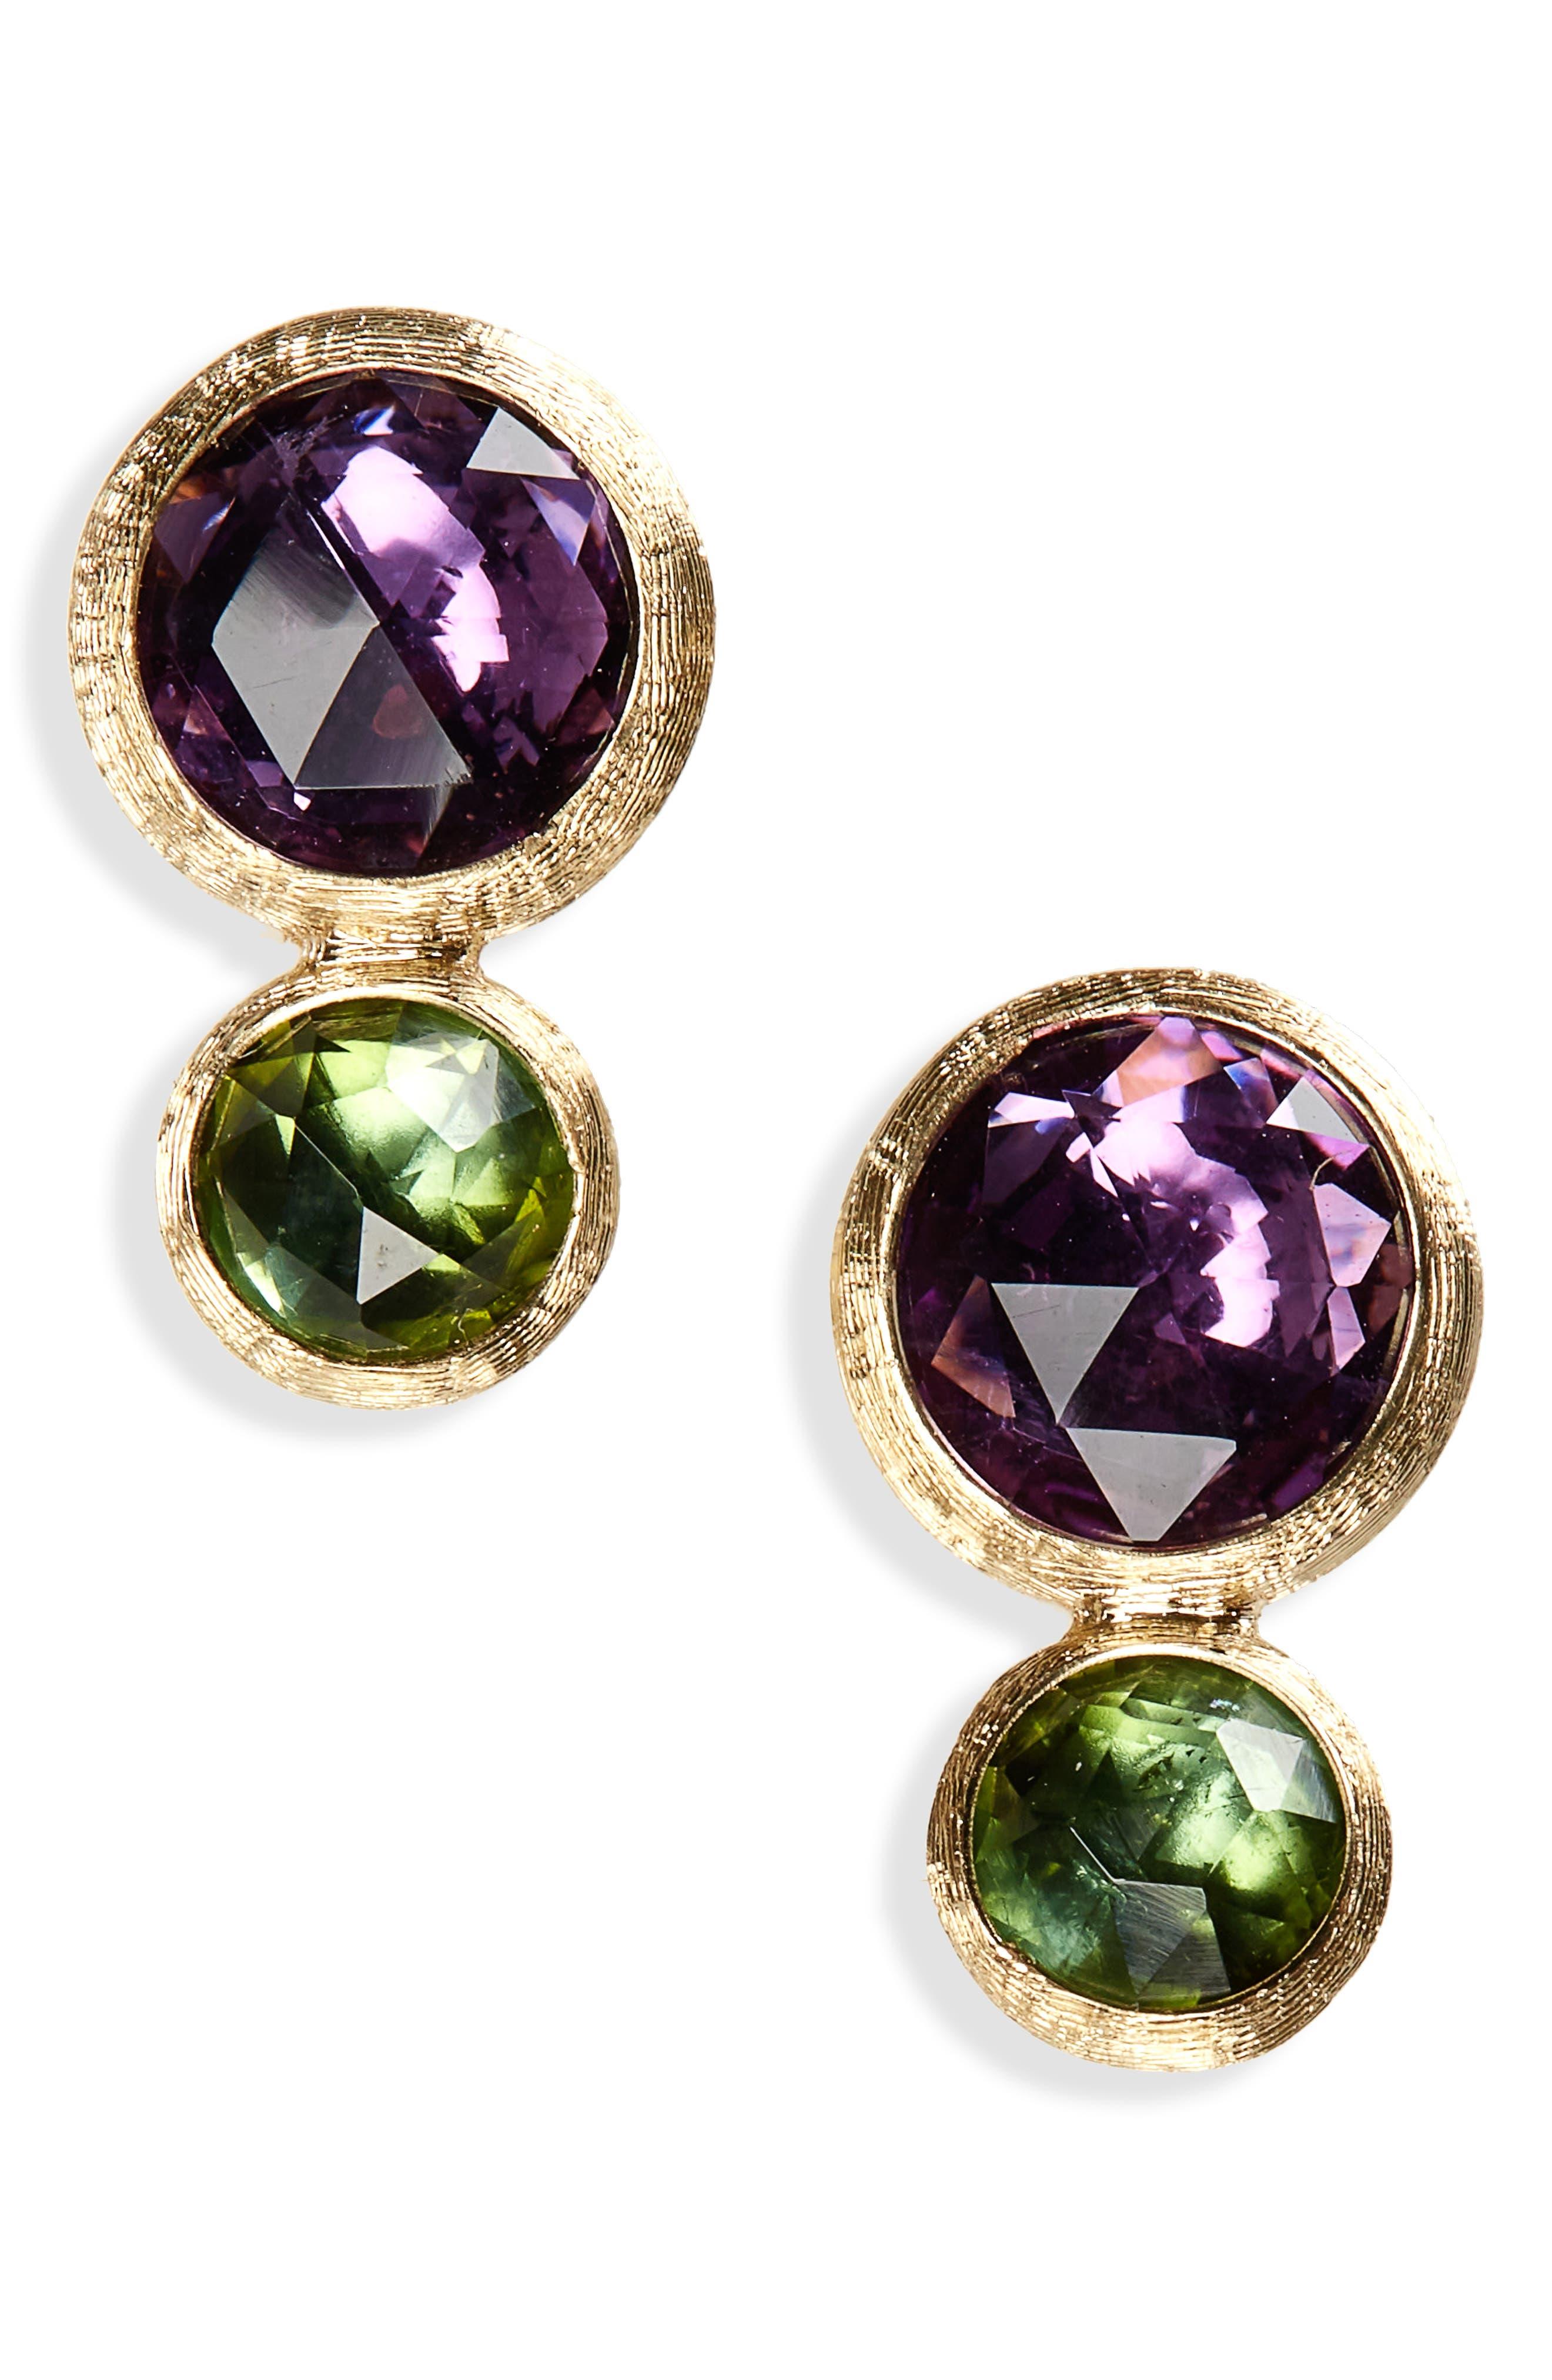 Jaipur Amethyst & Tourmaline Stud Earrings,                             Main thumbnail 1, color,                             710